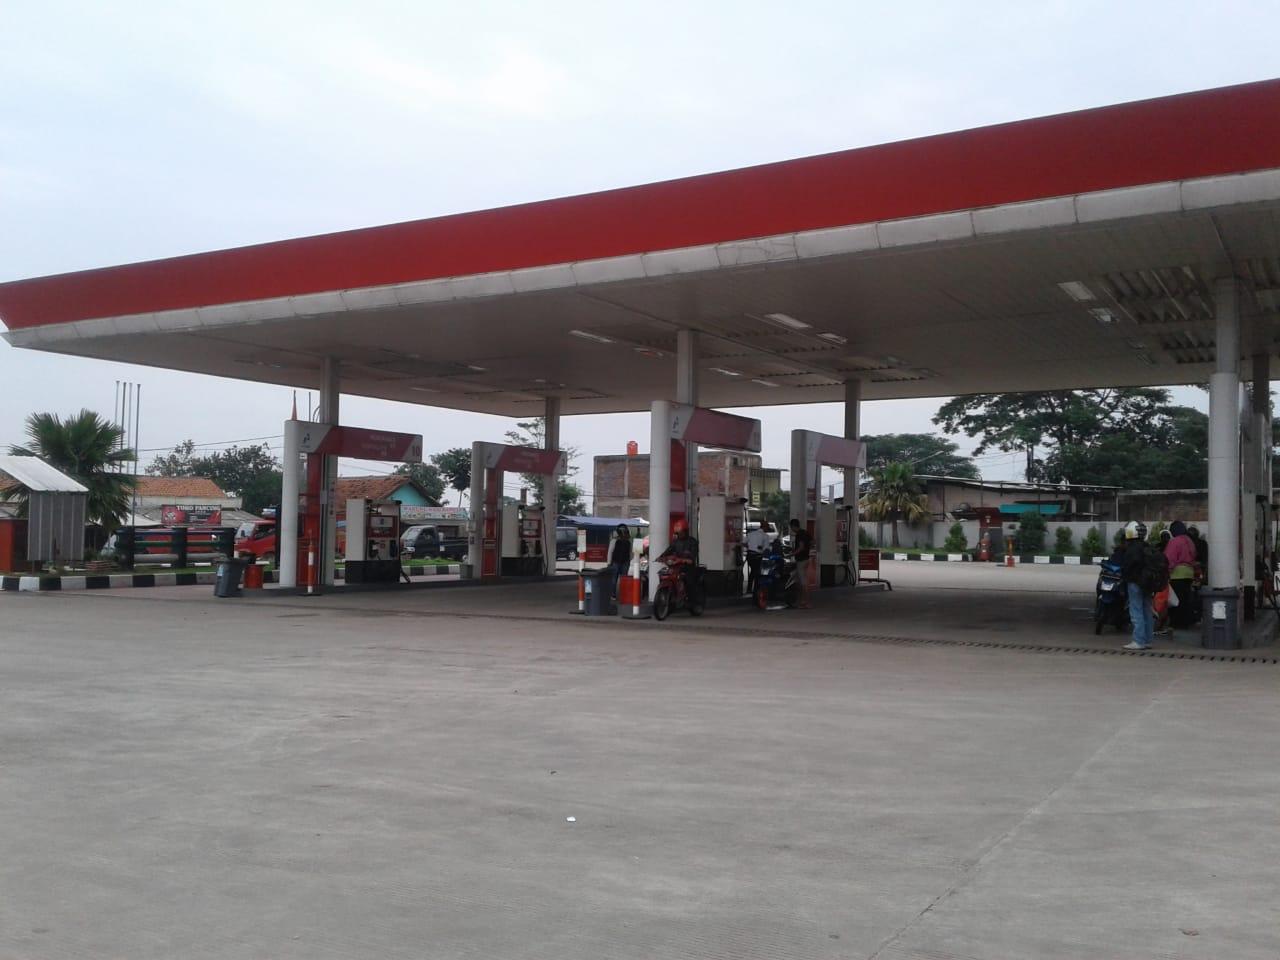 Kabupaten Bandung Diterjang  Banjir, Beberapa SPBU Tidak Bisa Beroperasi